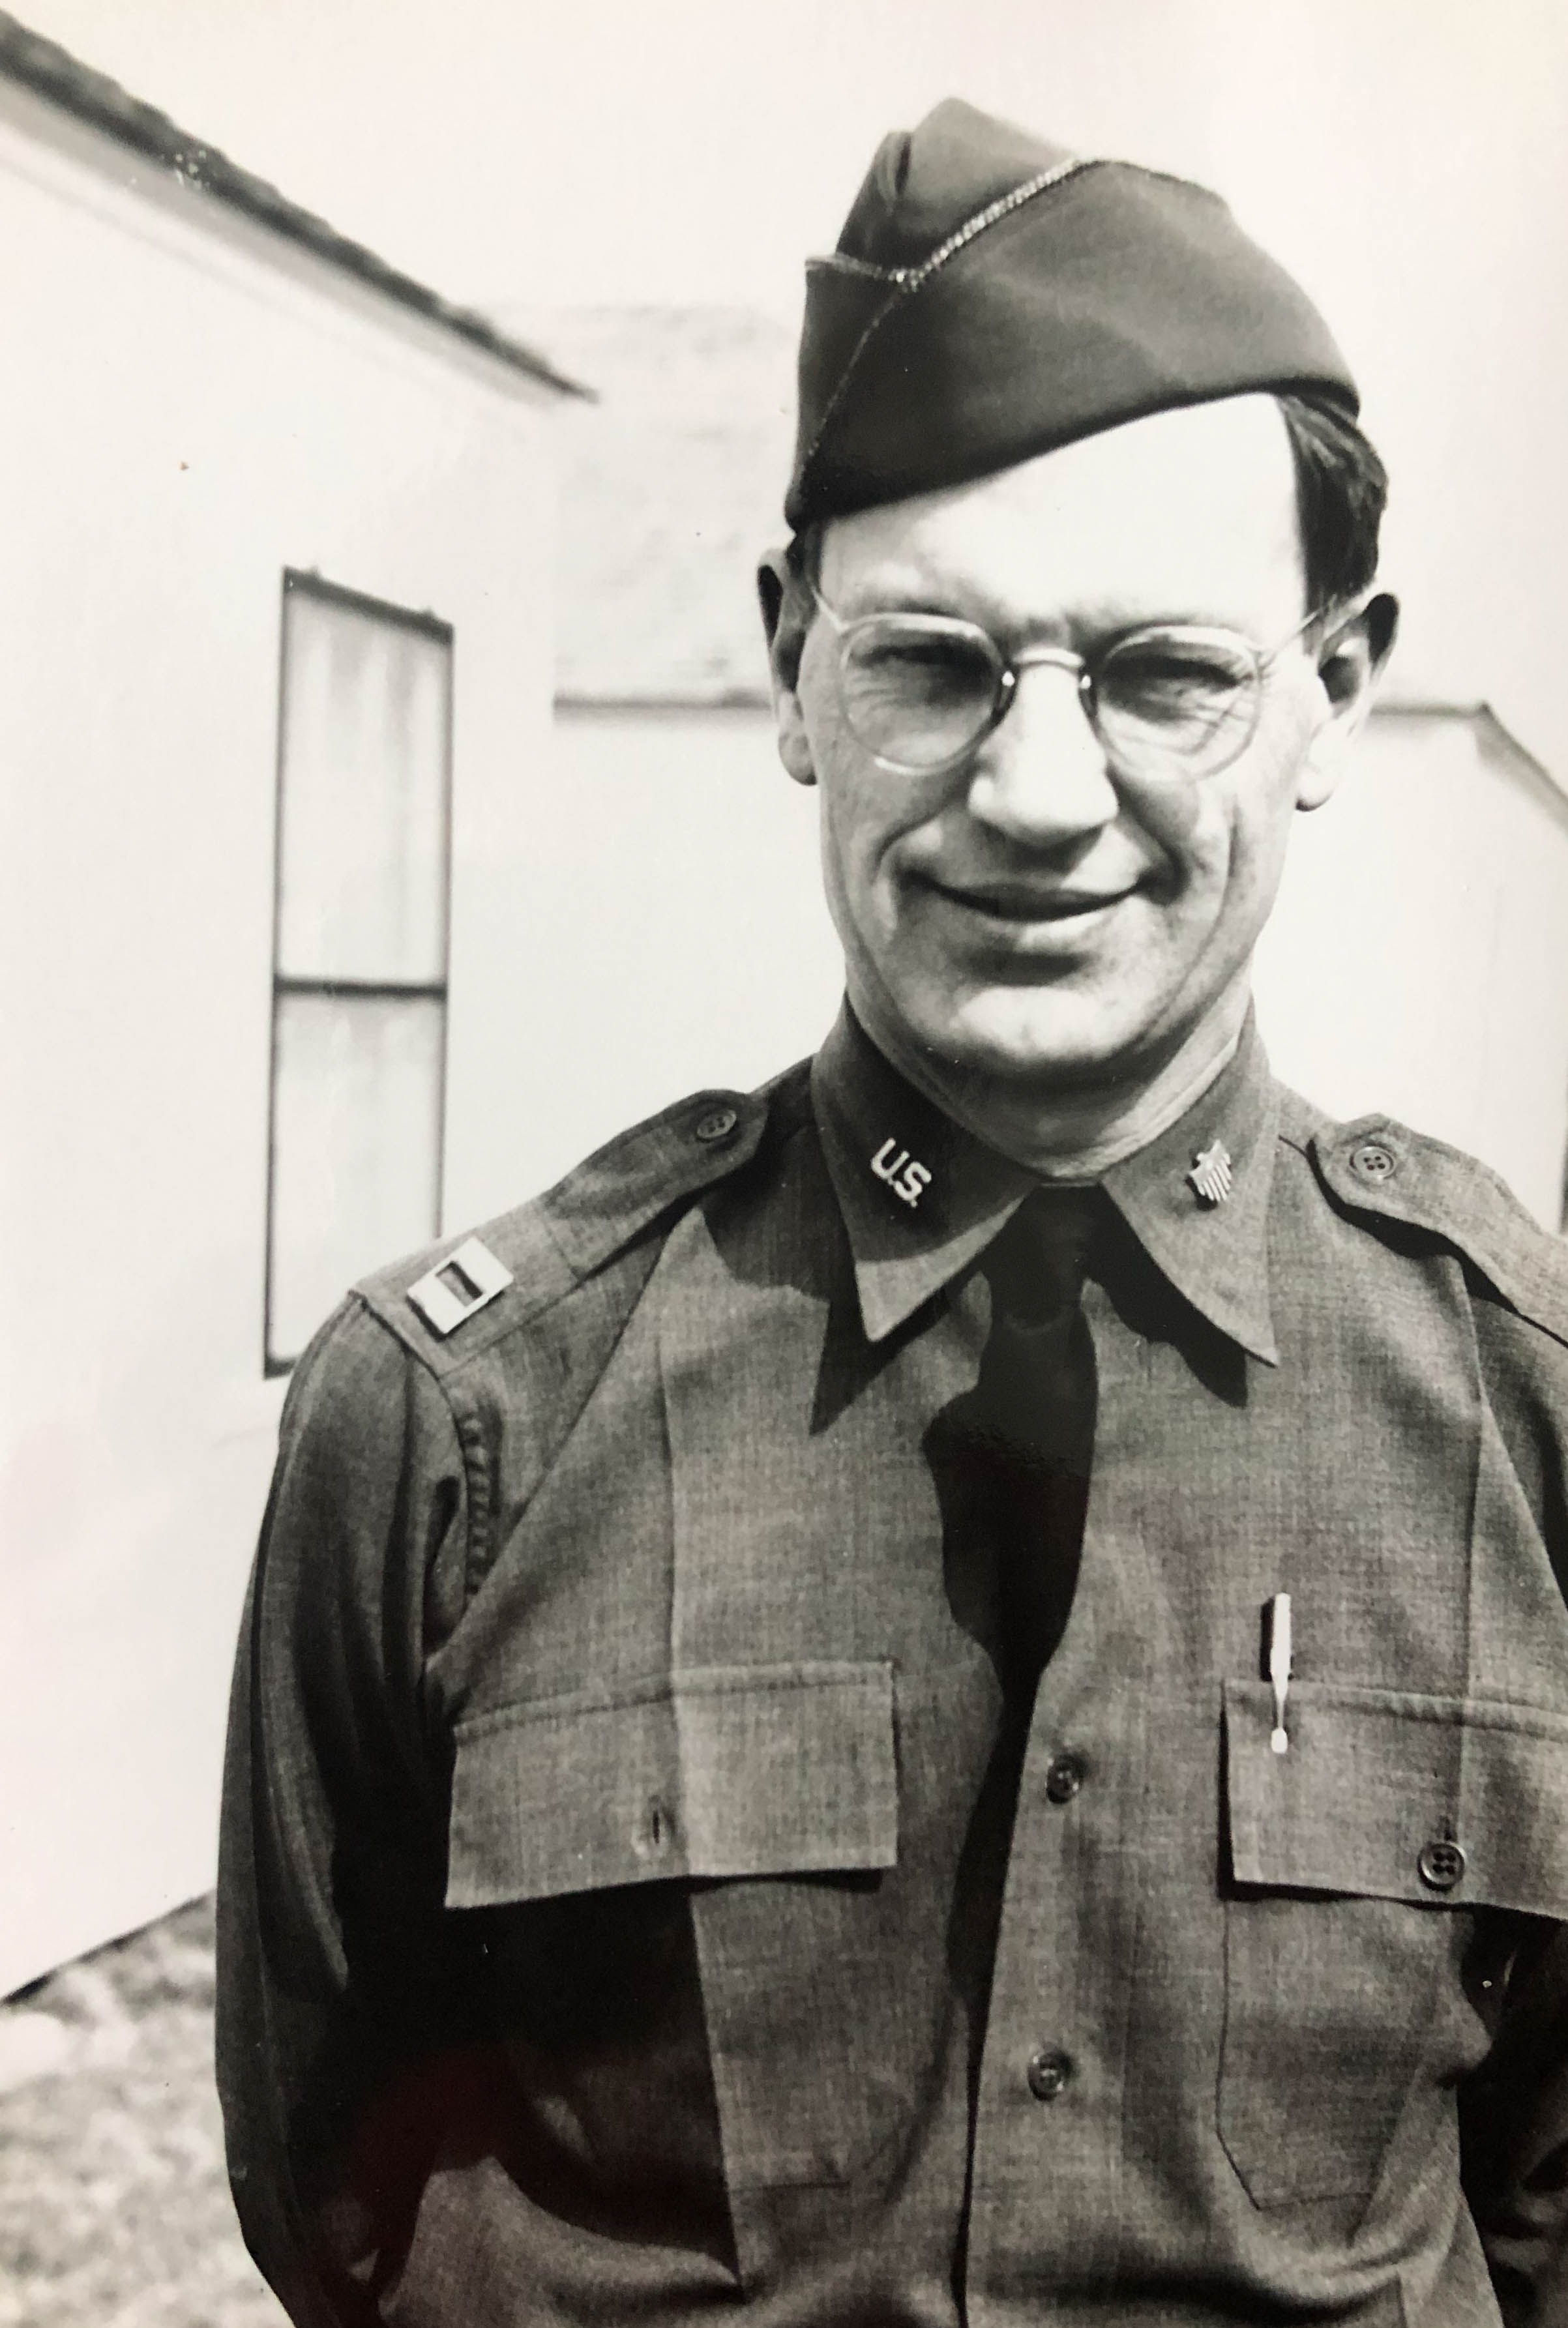 Freeman Macomber in uniform